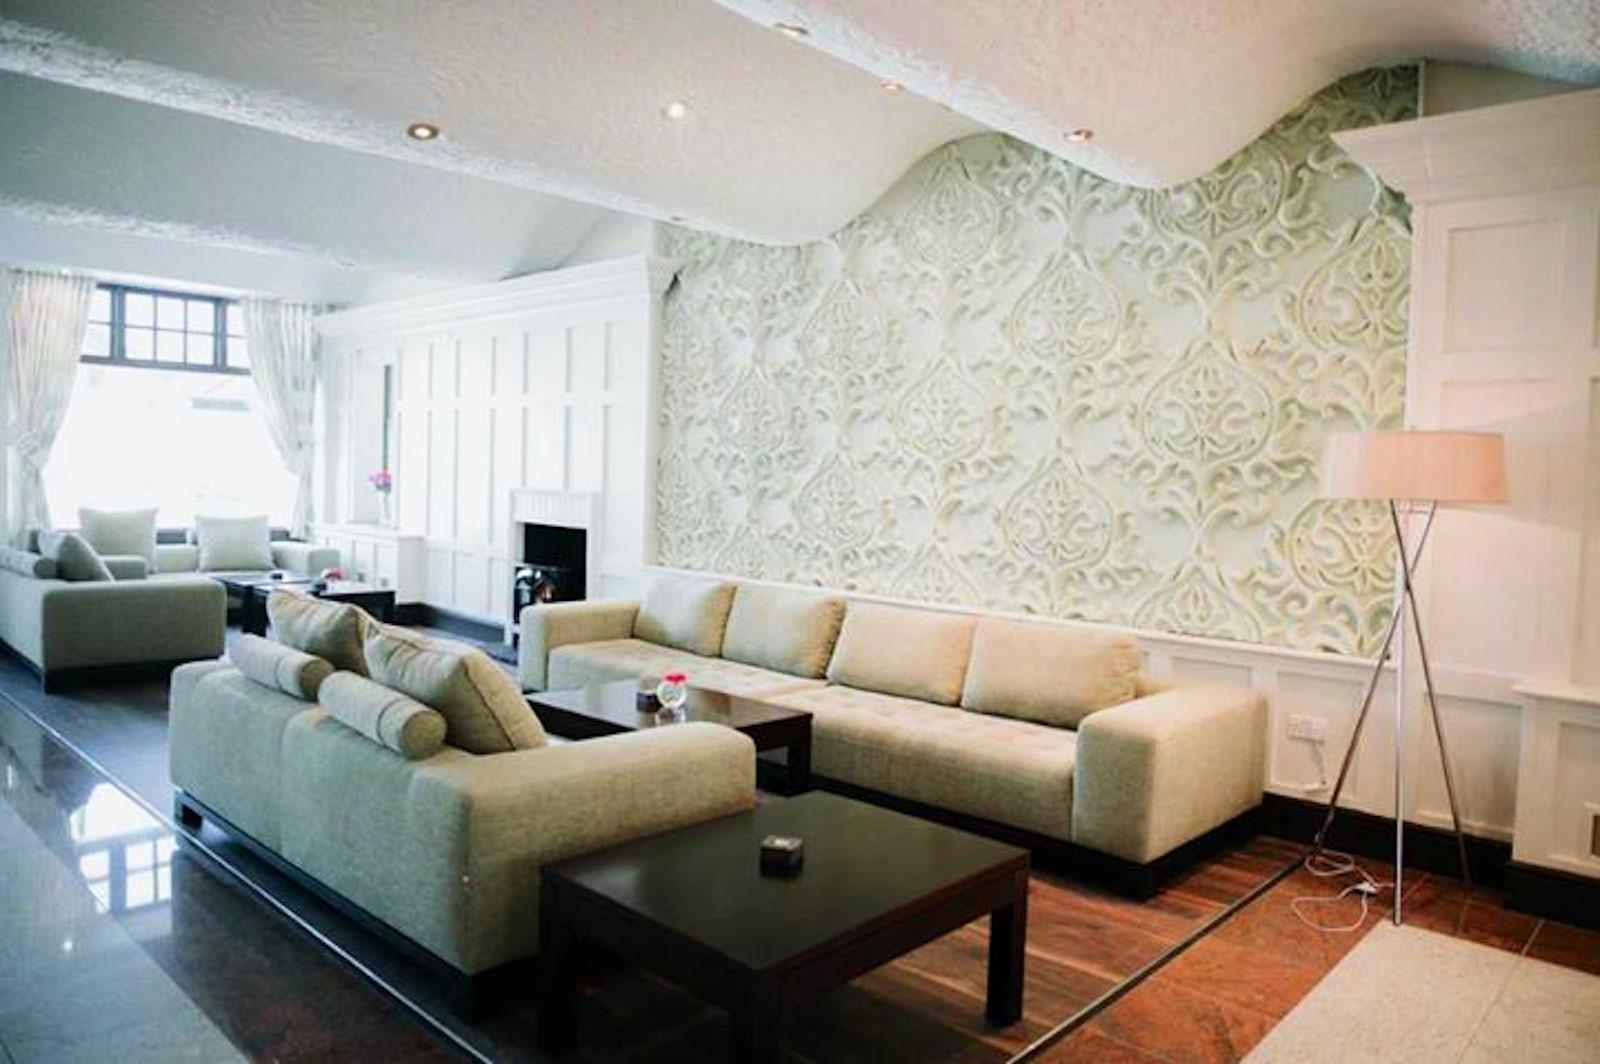 Travel inspired - Location - Skellig Star Hotel   itinari